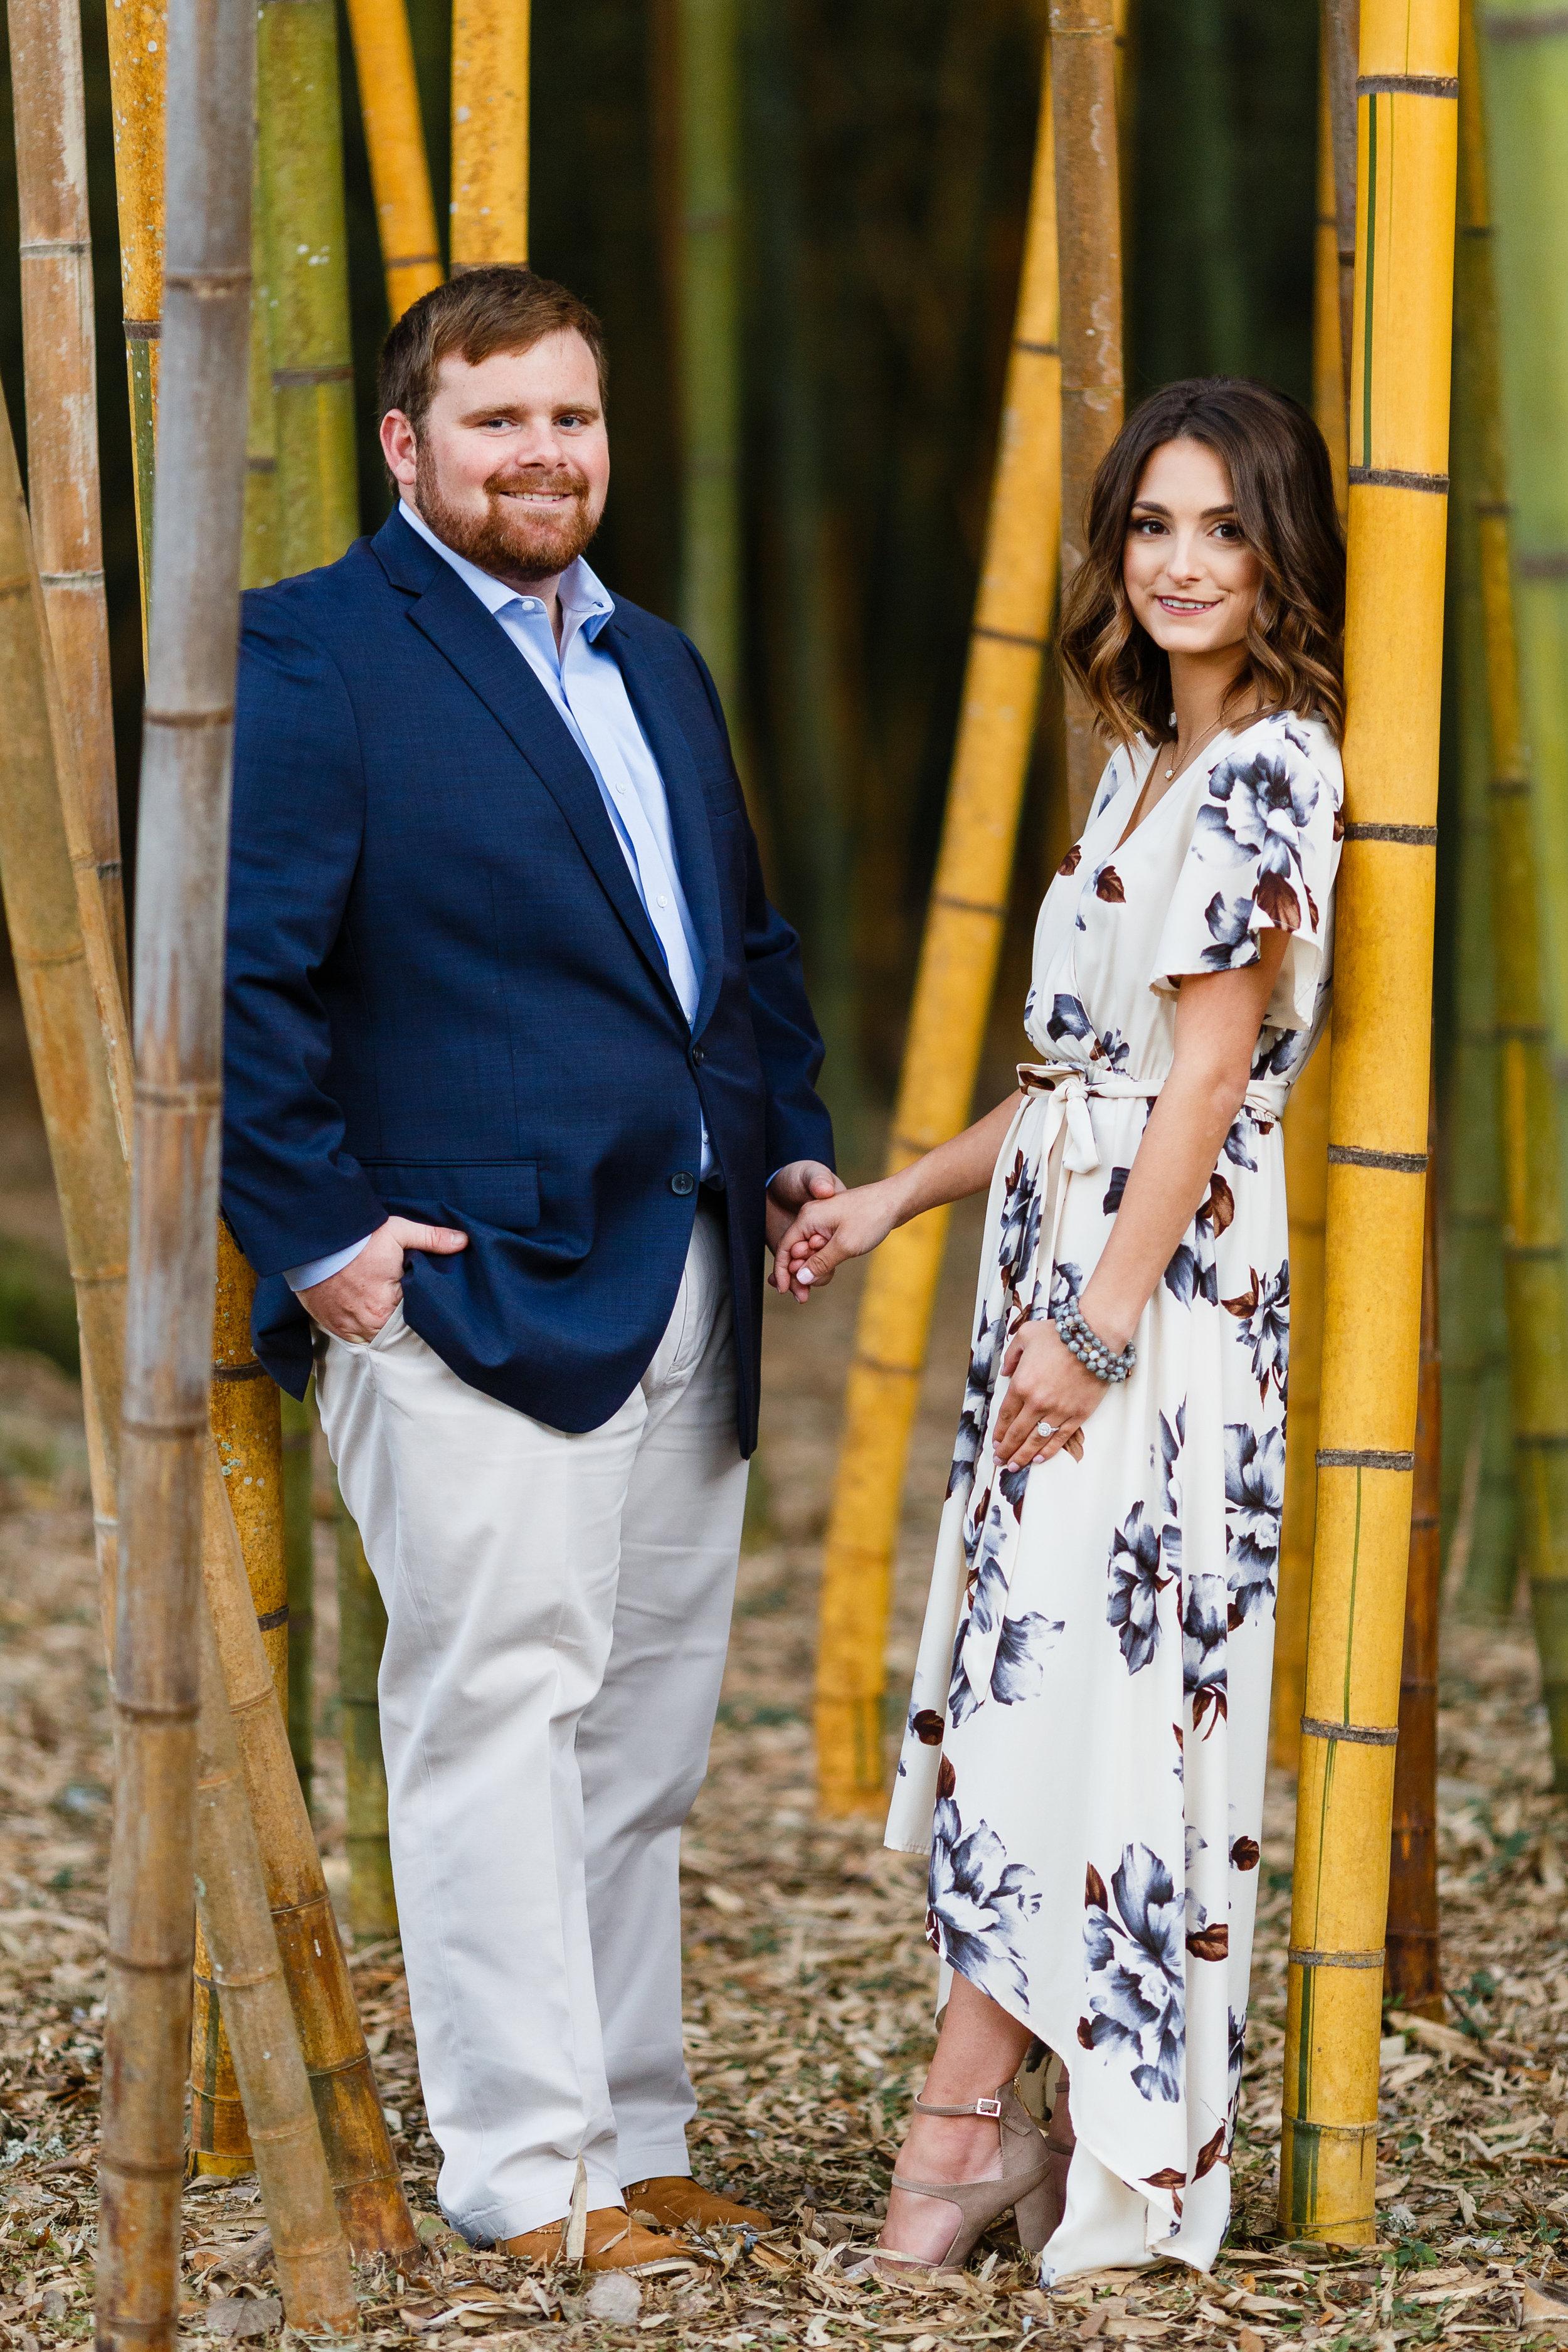 Youngsville-lafayette-portrait-family-wedding-photographer-9238.jpg